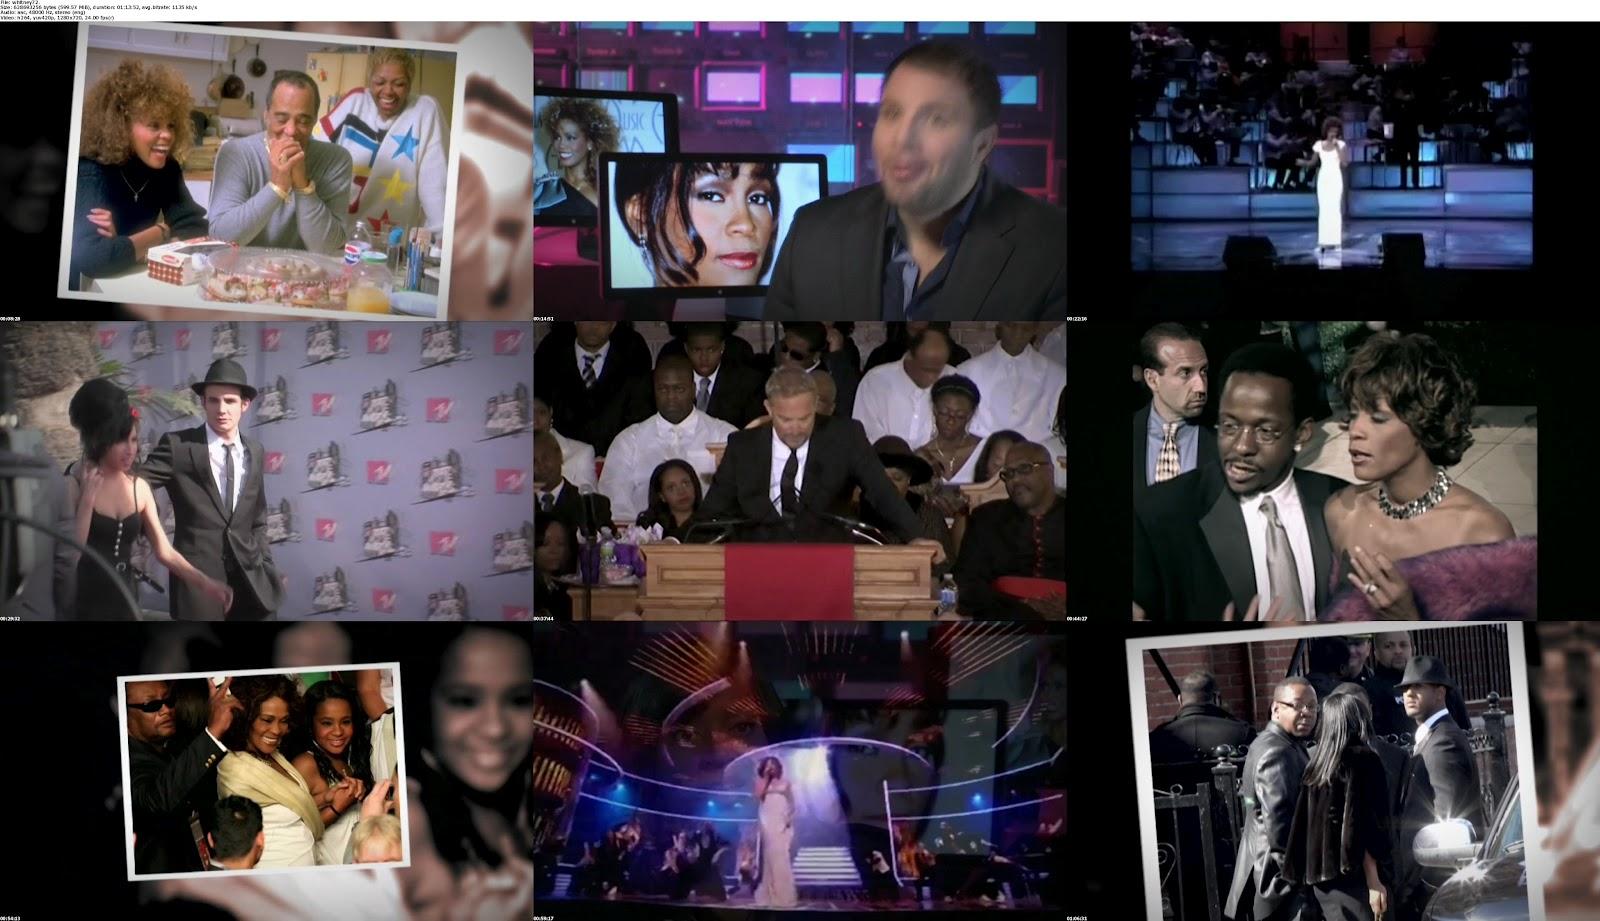 http://1.bp.blogspot.com/-Y_laQIot8dw/UA78cmlBOuI/AAAAAAAAHEI/tOC_DZT_KGA/s1600/Whitney+Houston+We+Will+Always+Love+You+%282012%29+BluRay+720p+BRRip+600MB+hnmovies.jpg